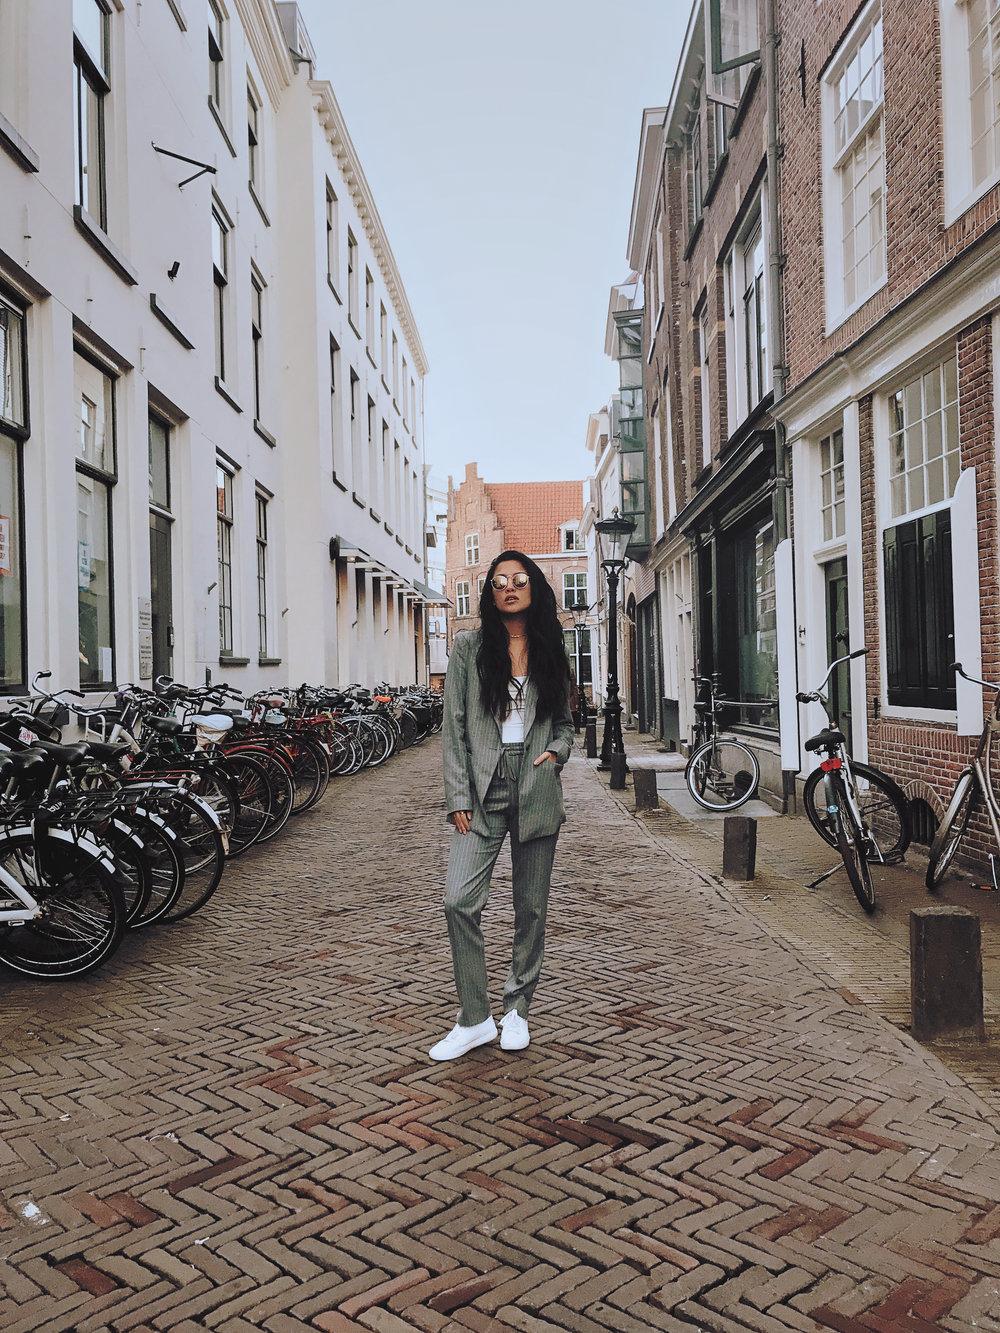 h&m jacket | h&m pants | delphine bodysuit | crap eyewear shades | kenneth cole sneakers | photo by sean martin